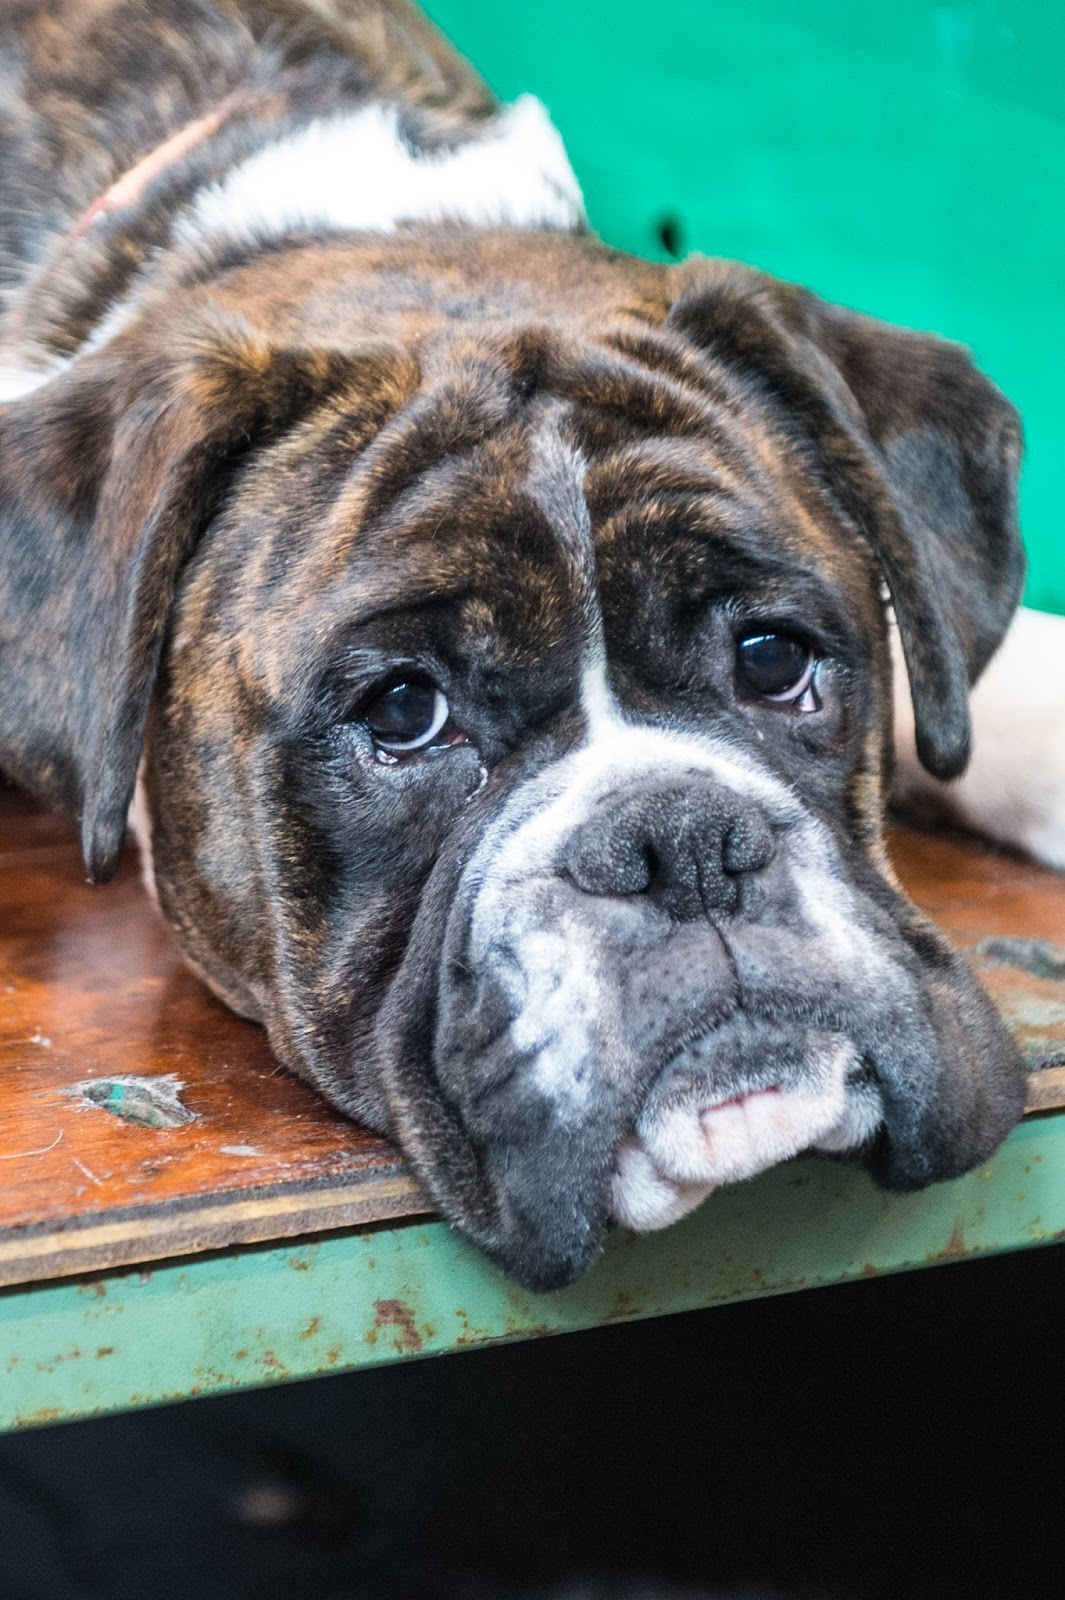 Bbc Documentary Pedigree Dogs Exposed Watch